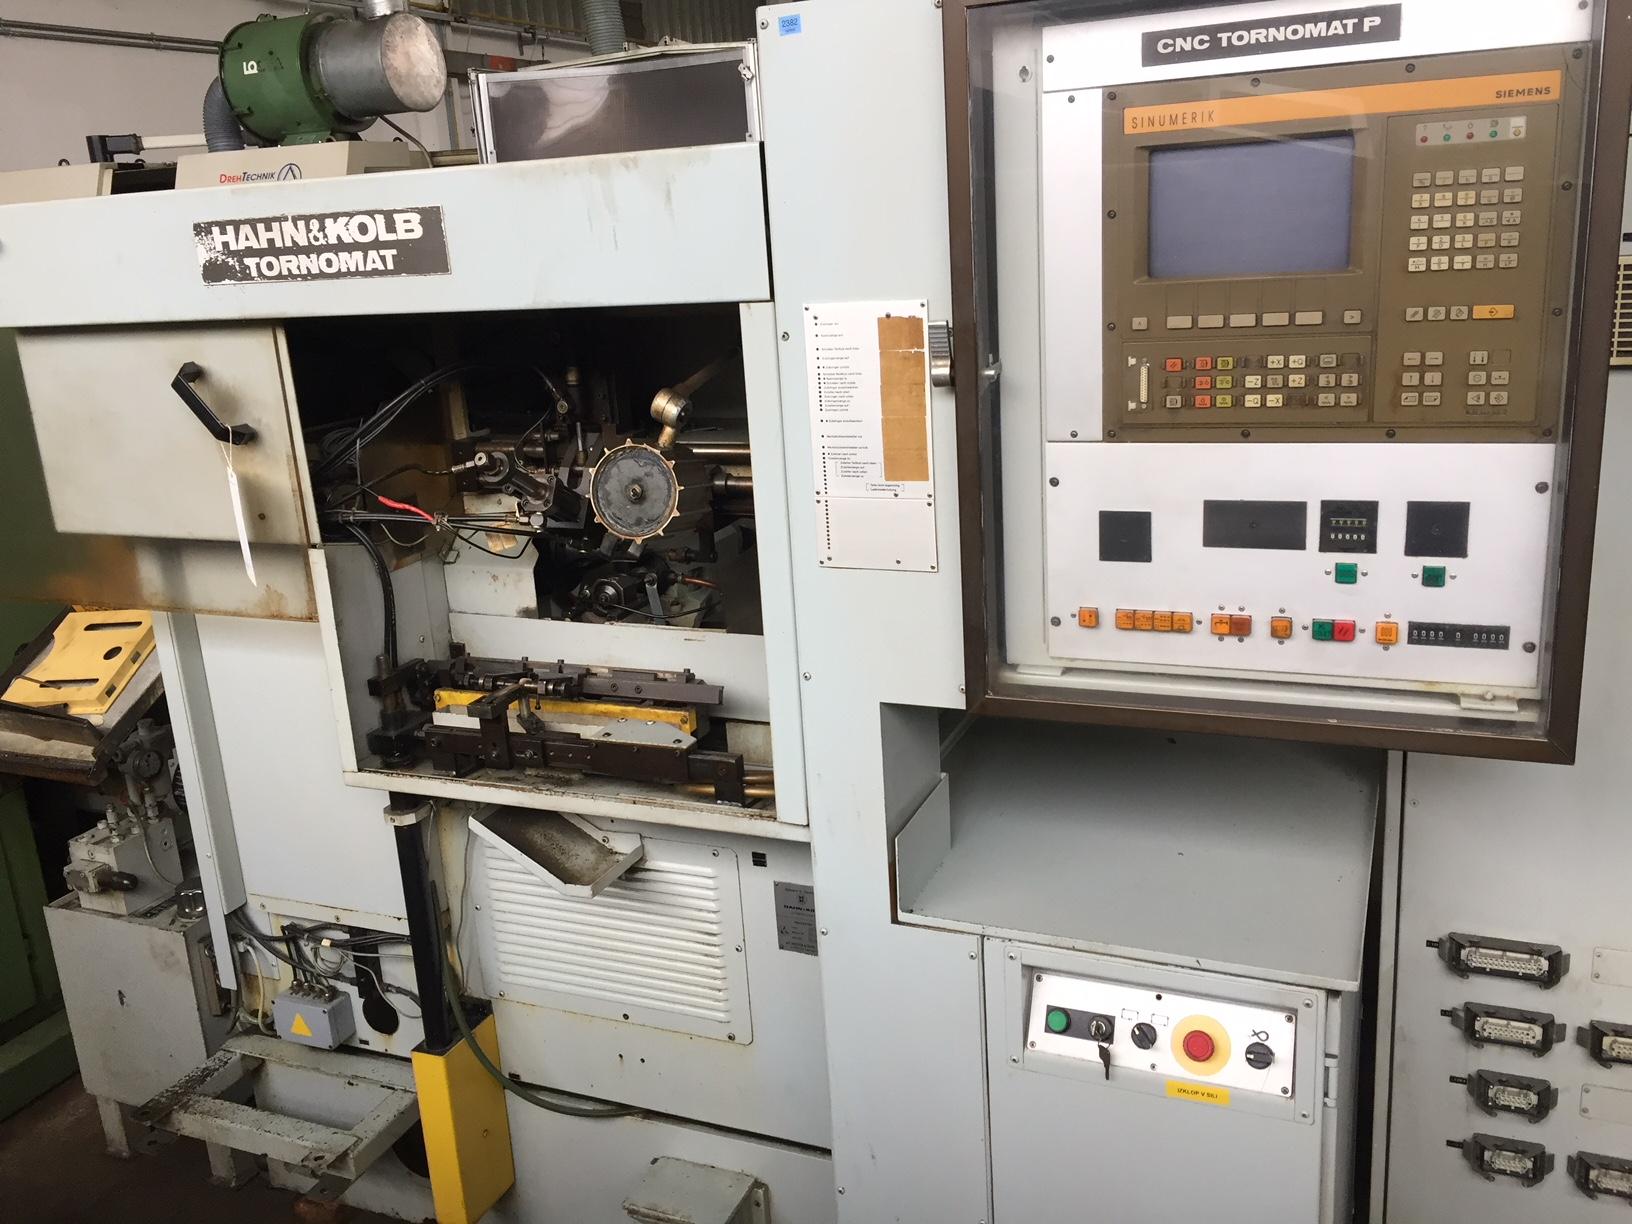 Lot 30 - Hahn & Kolb Model Tornomat 153 TP/S